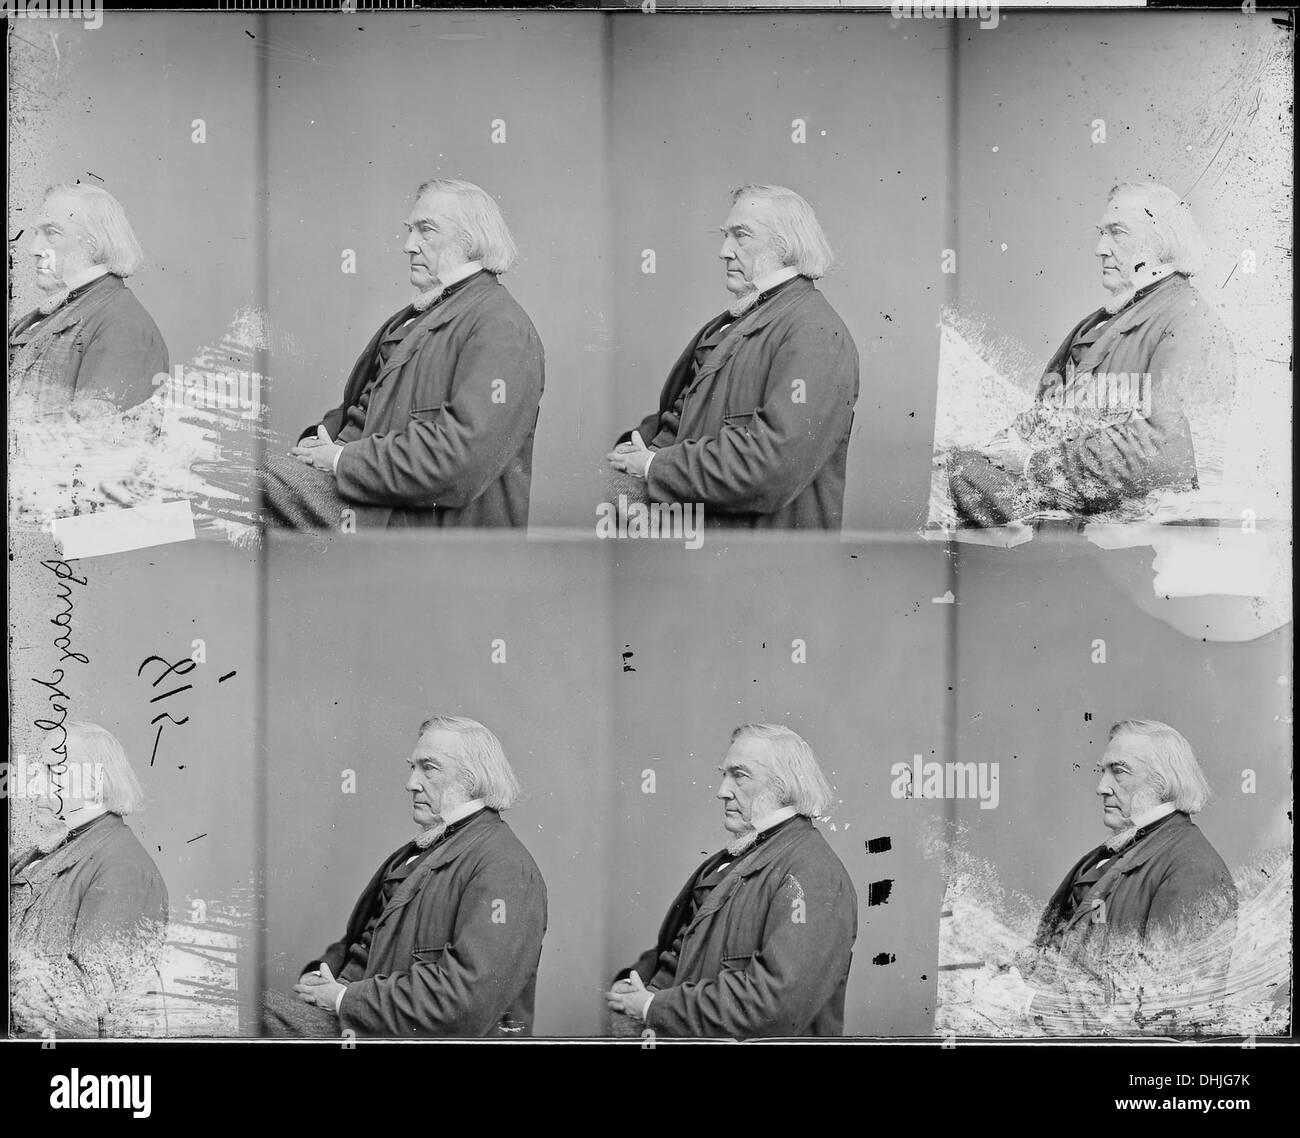 Judge Samuel Nelson, U.S. Supreme Court 526621 - Stock Image